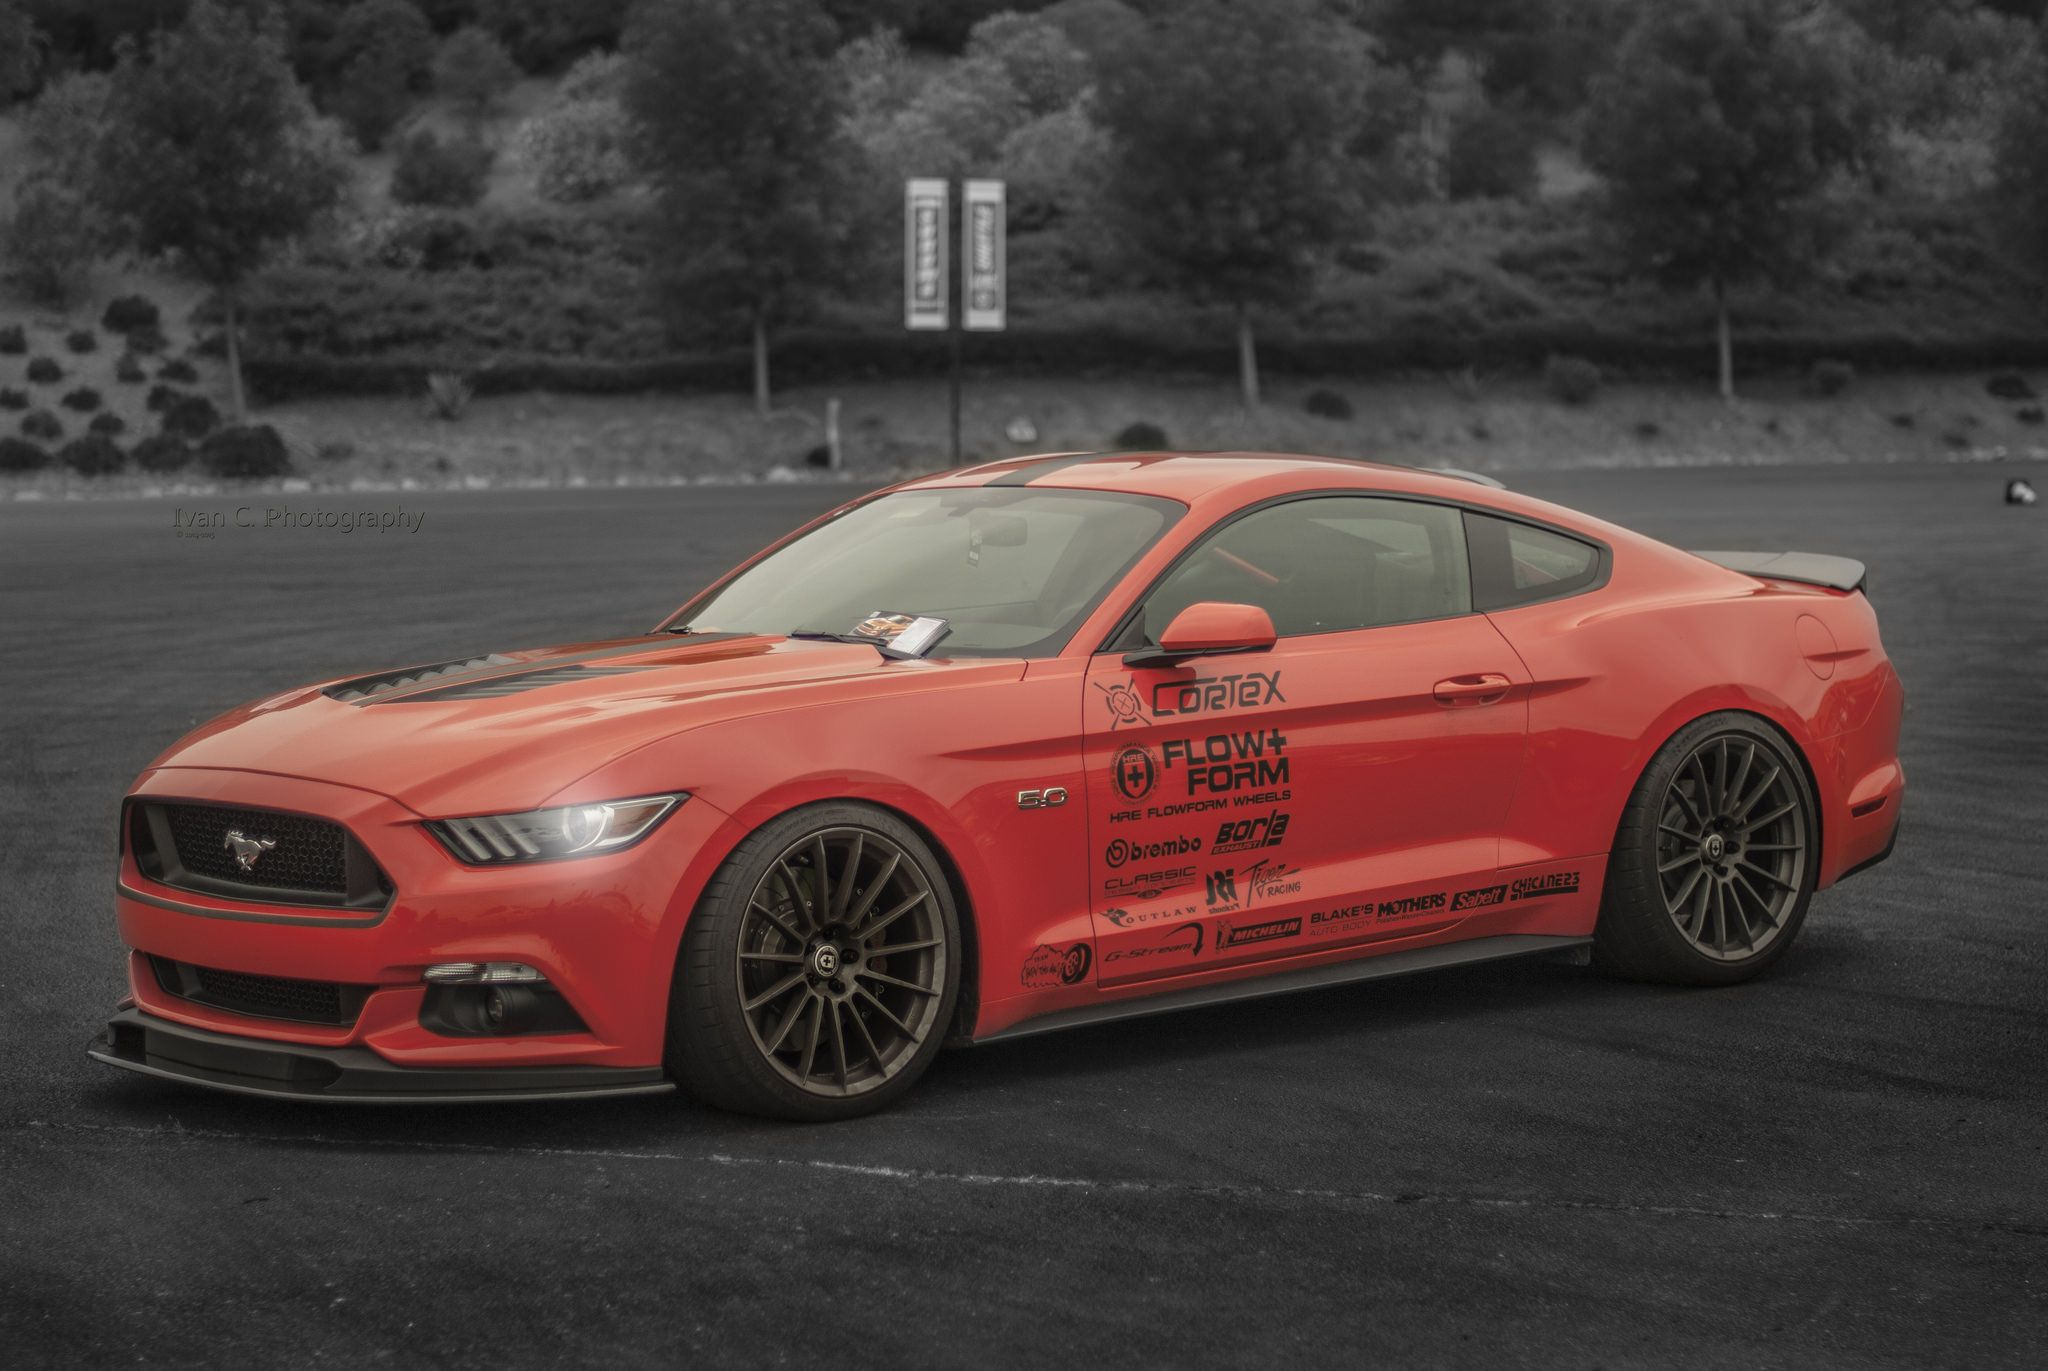 Mustang 5 0 mustang Pinterest